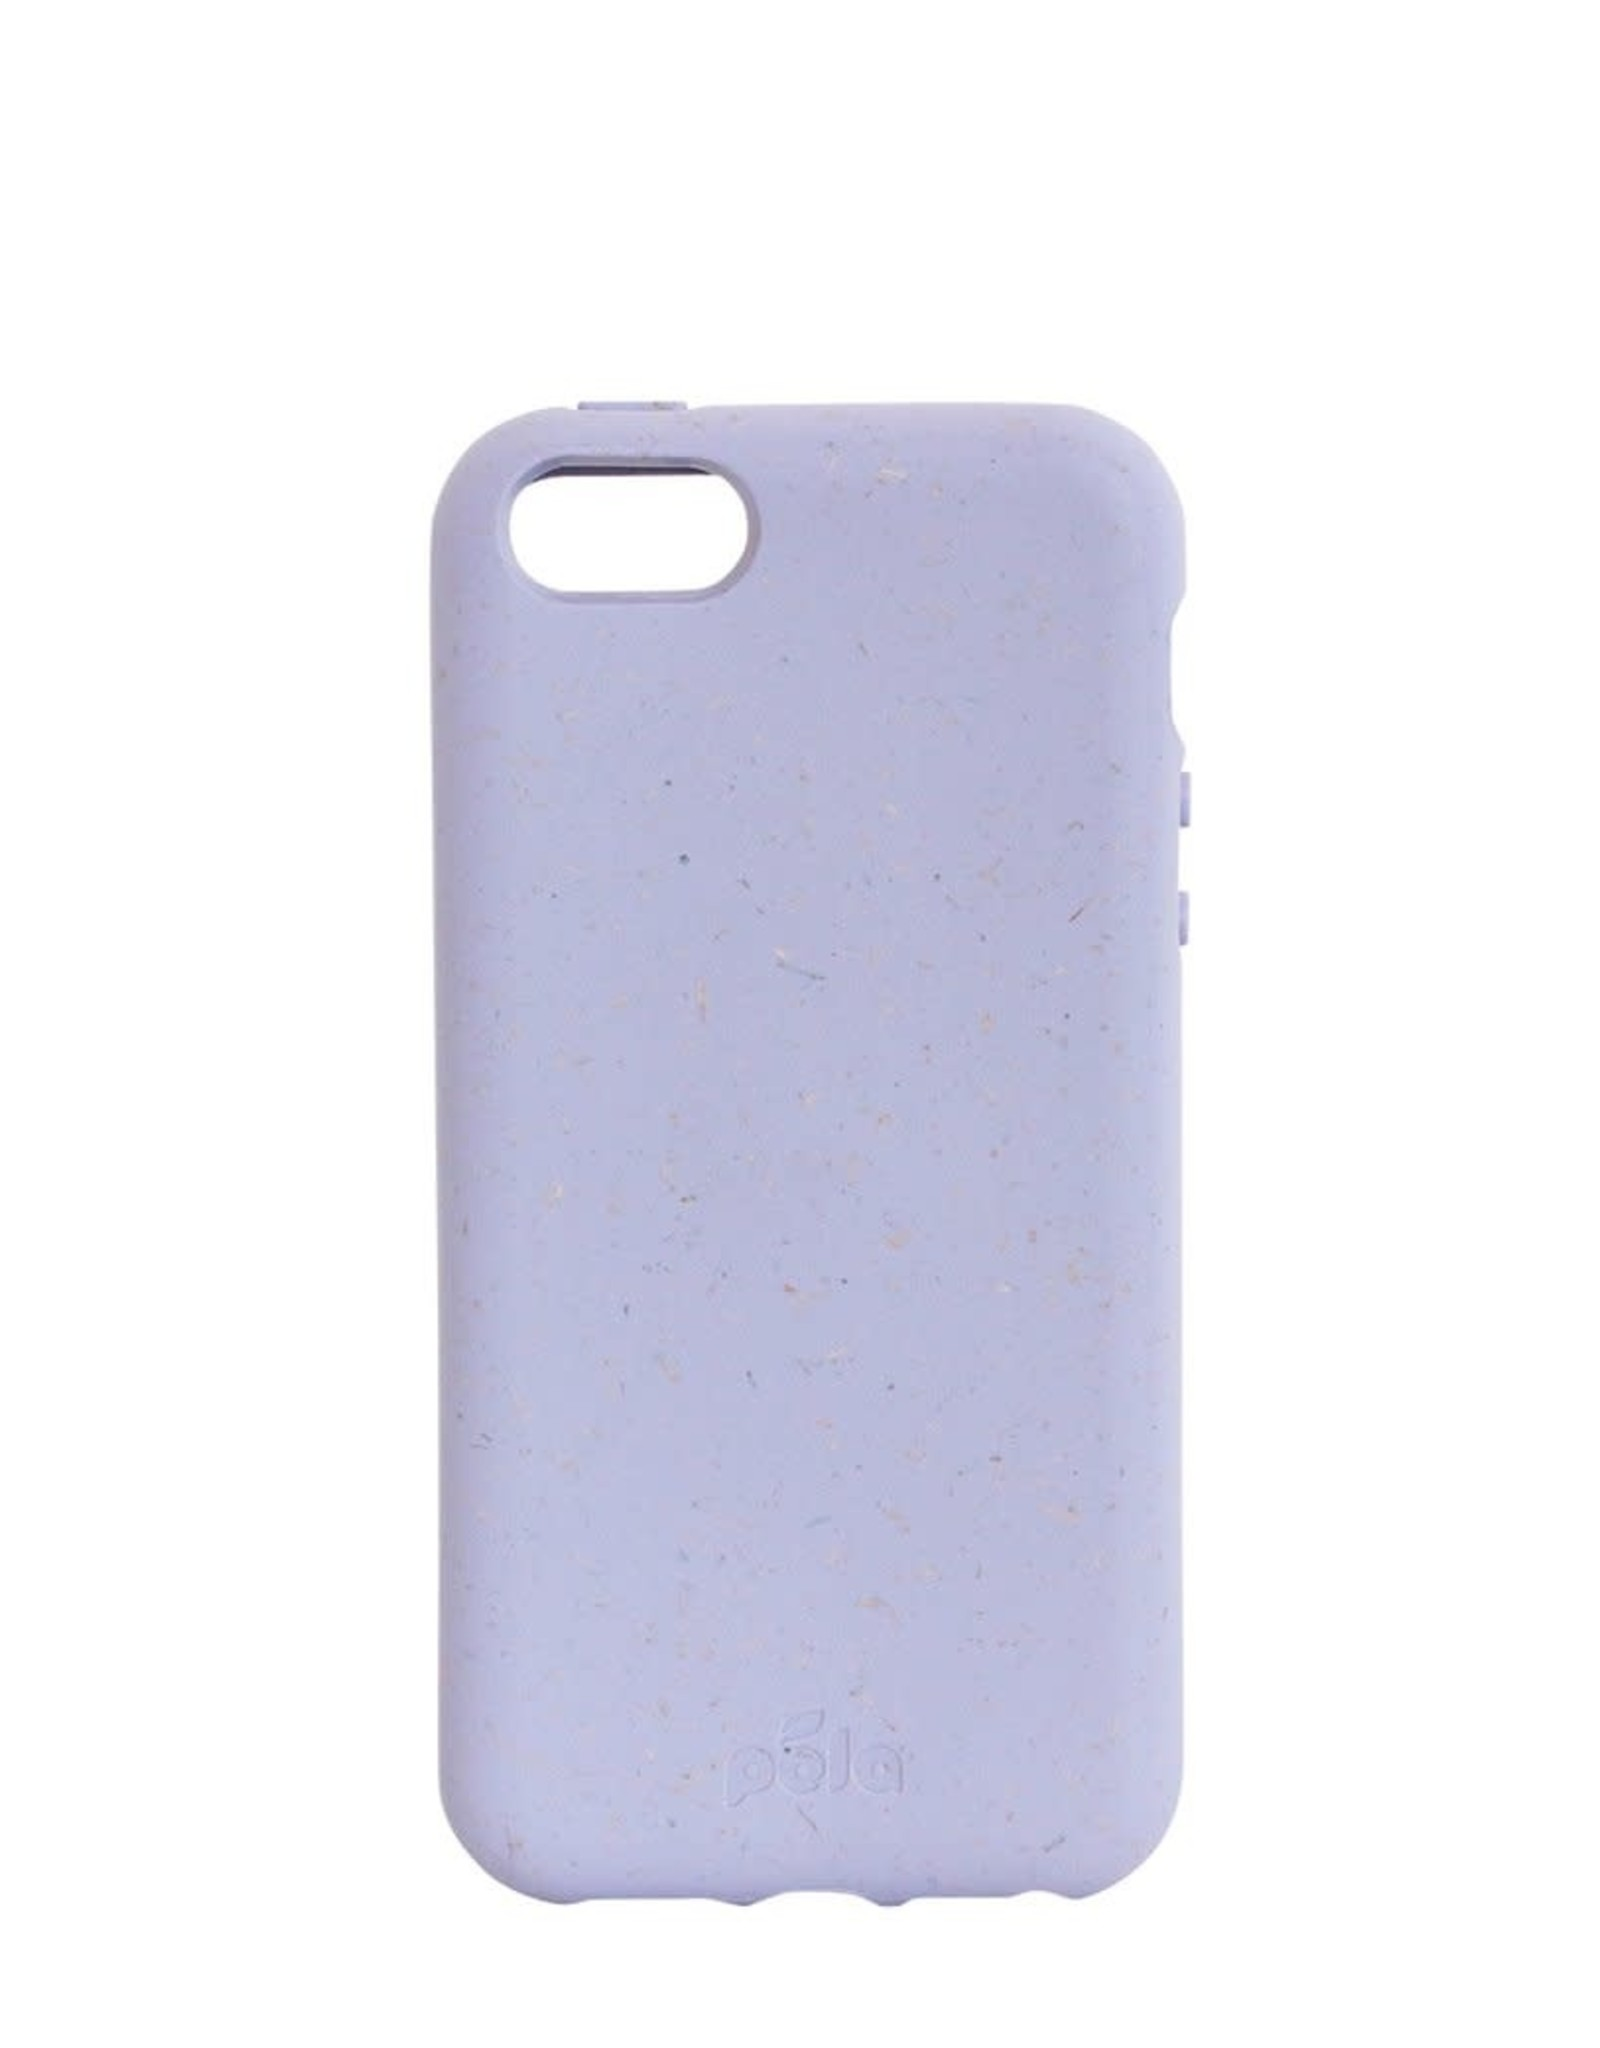 Pela Pela iPhone 5/5S/SE Case